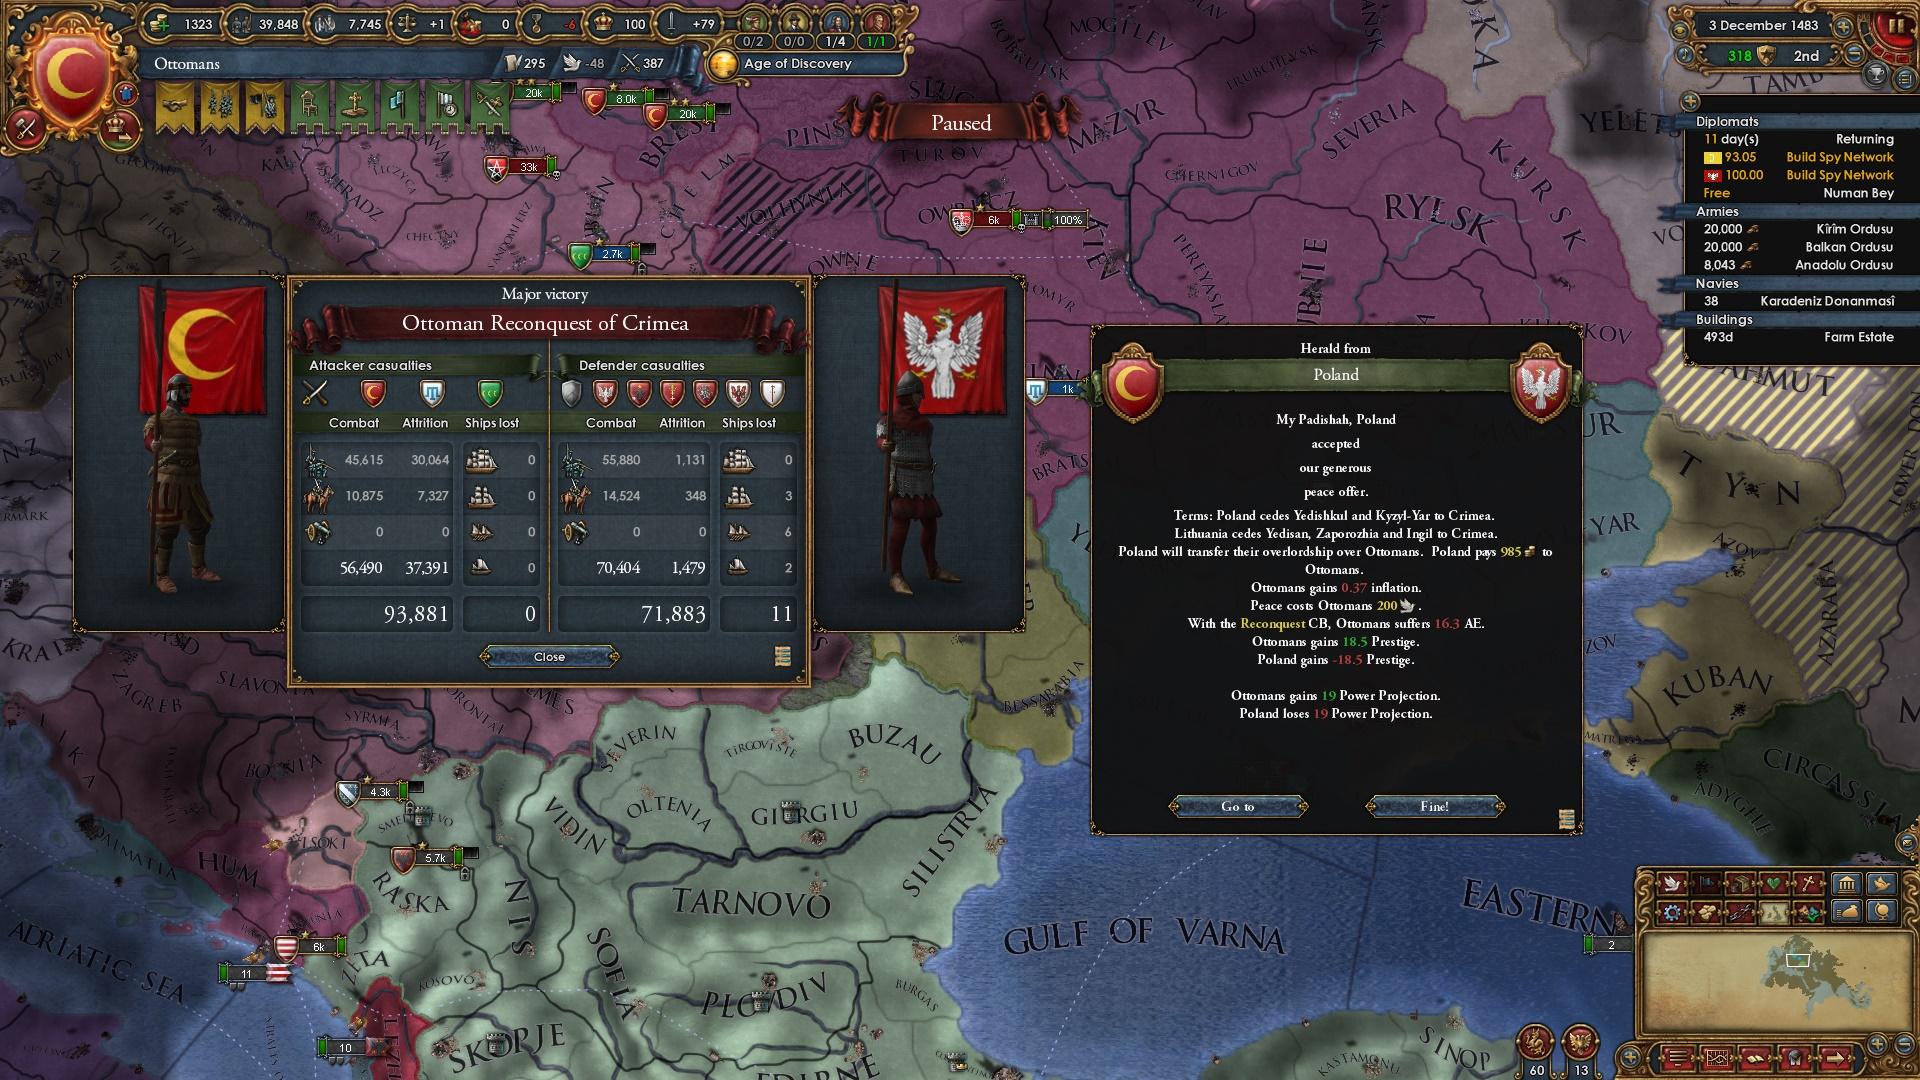 EU4 has an UI problem   Paradox Interactive Forums